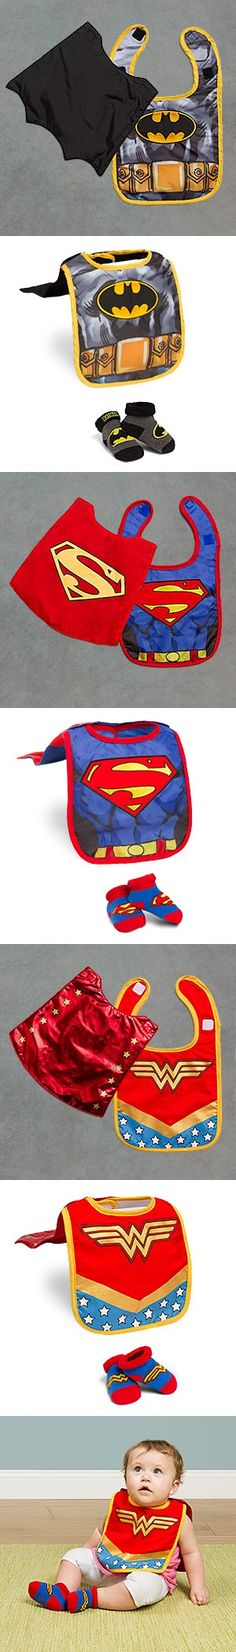 Superhero Infant Bib and Booties Sets